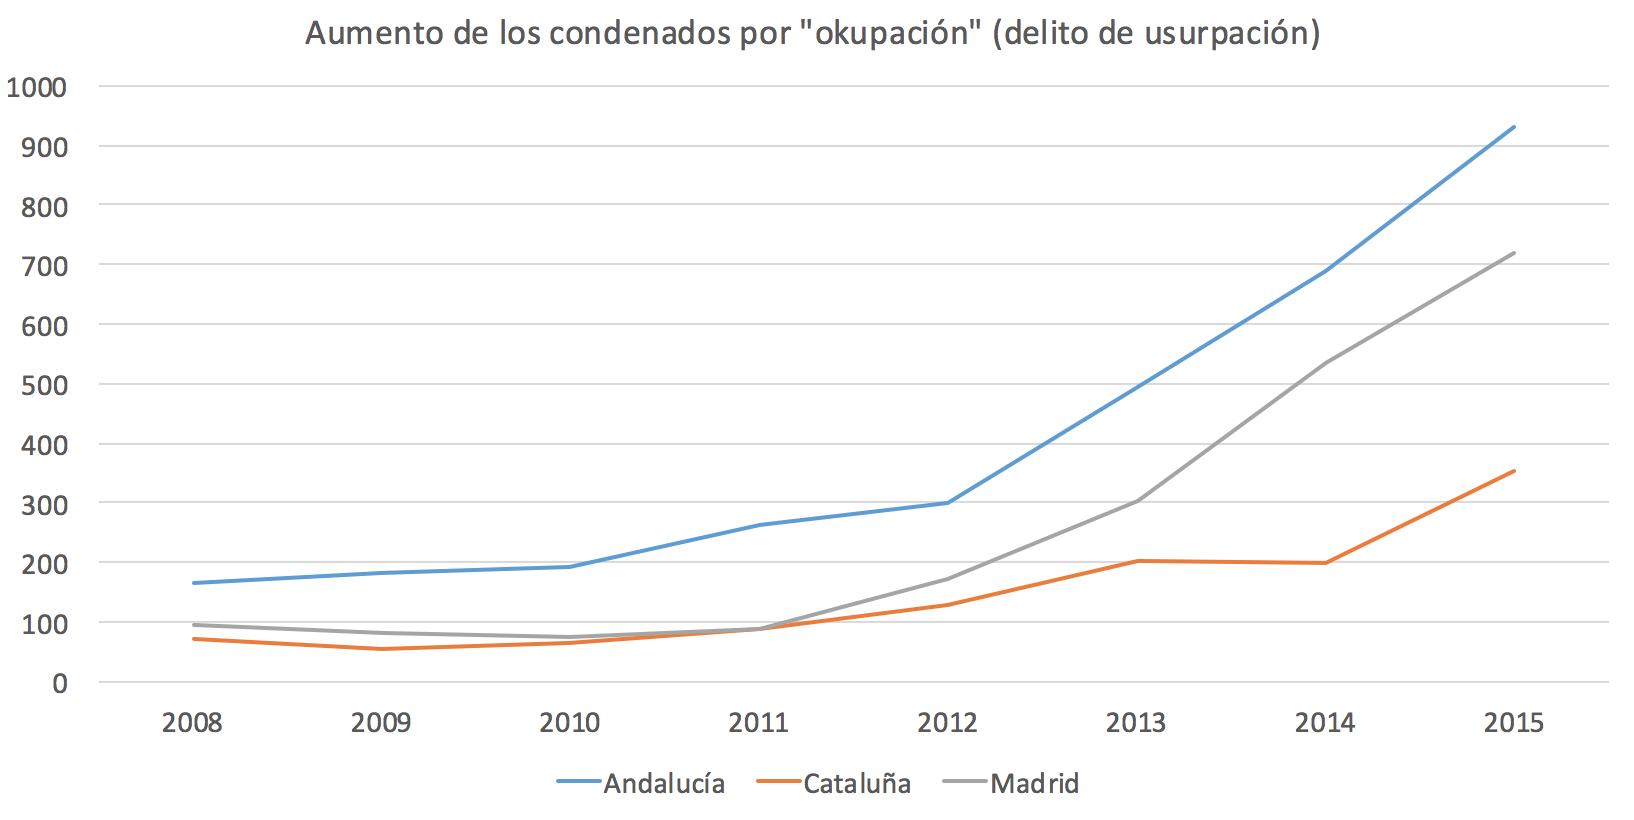 1-Okupas-Condenas-Madrid-Cataluna-Andalu